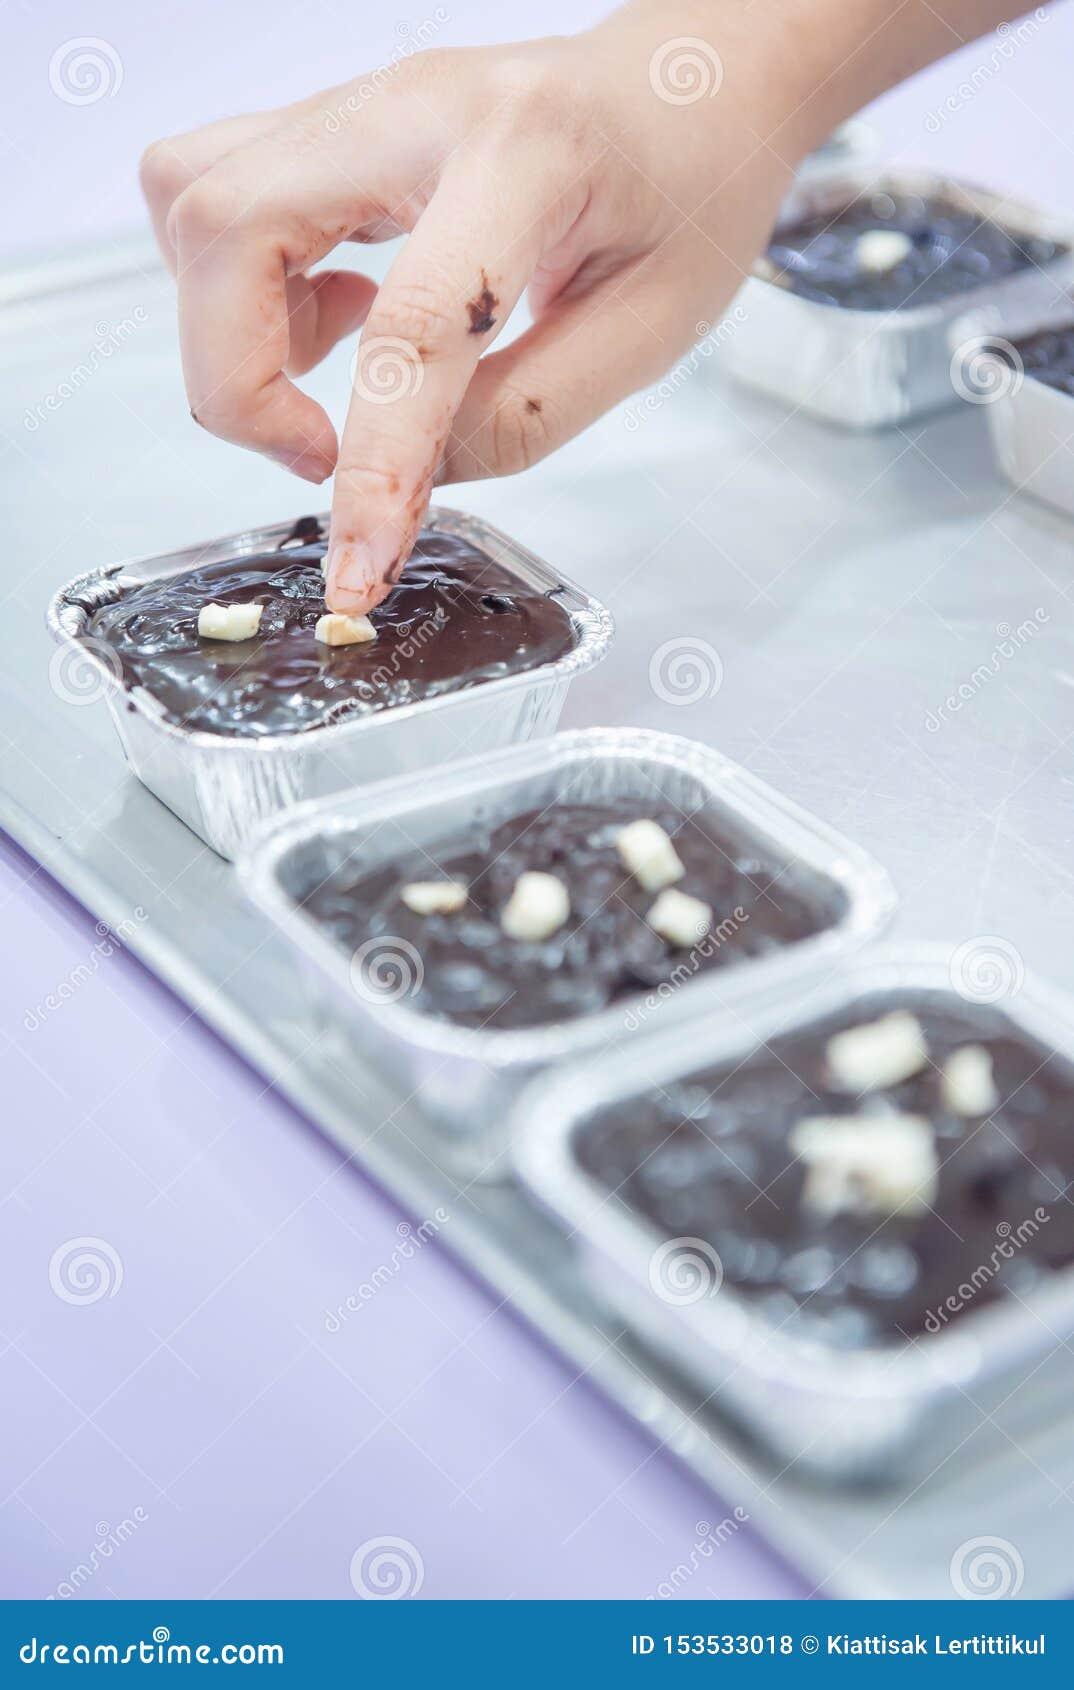 Schokoladenschokoladenkuchenhandfraueneibisch